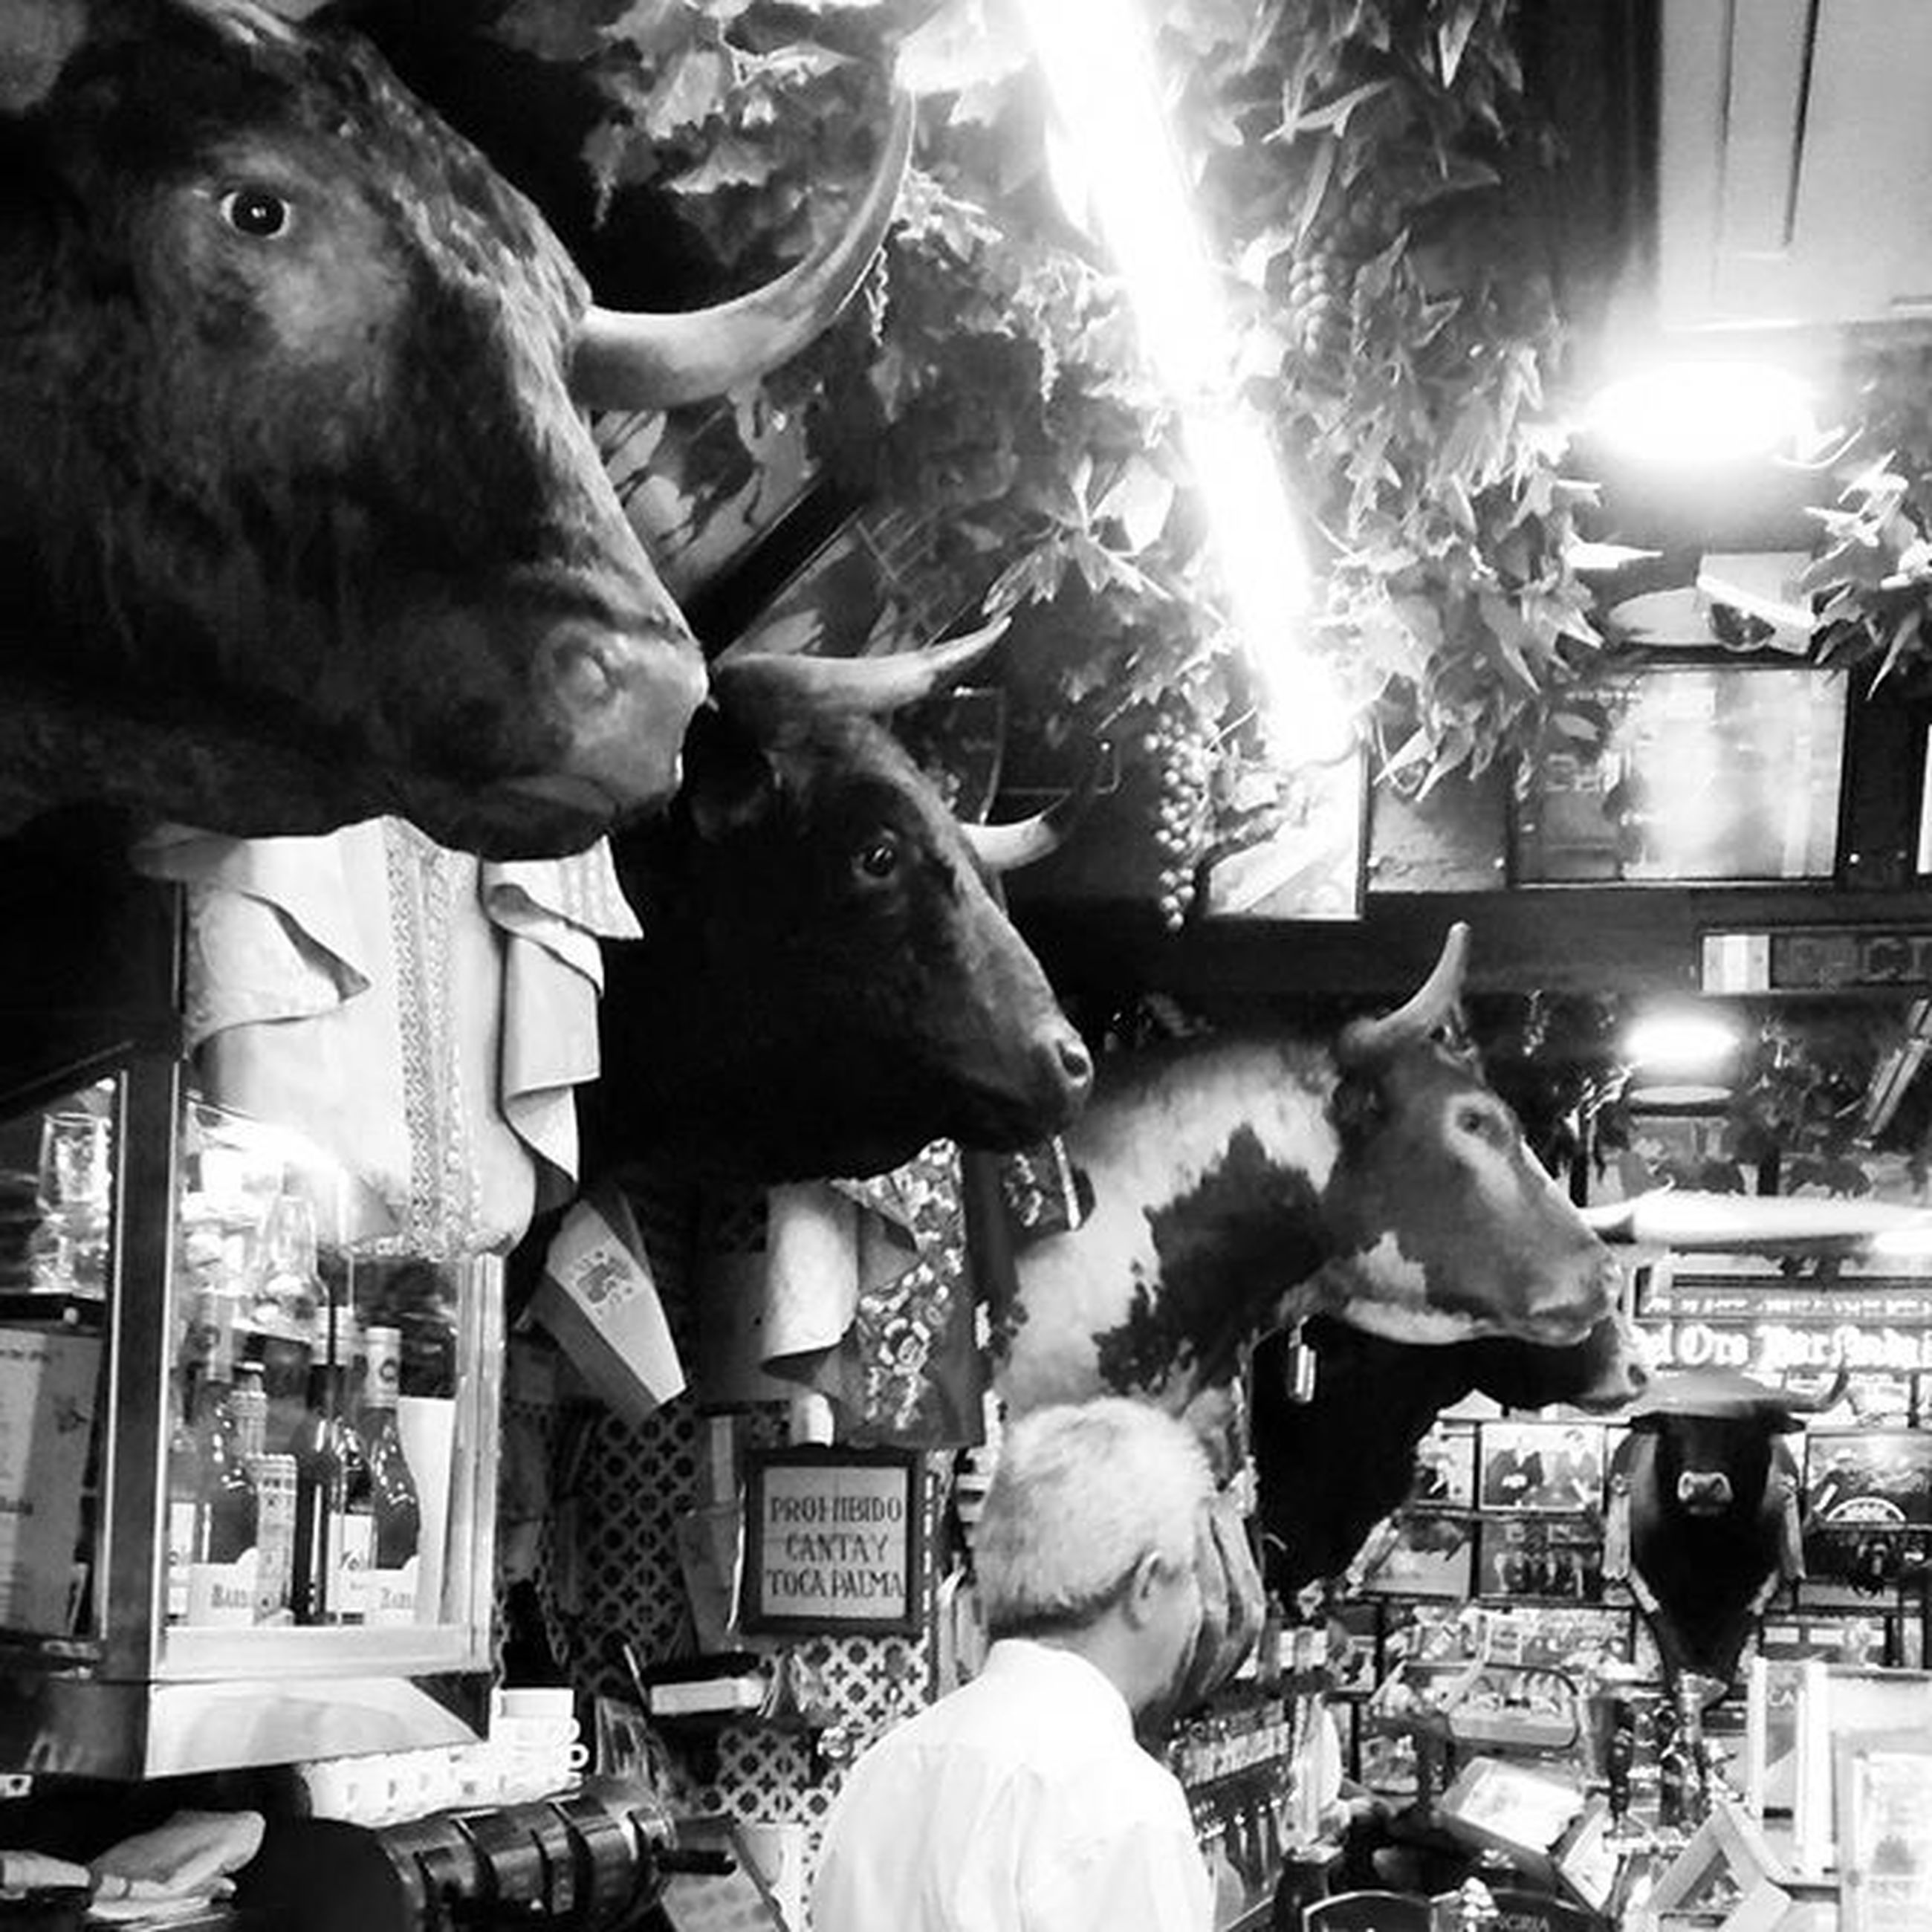 animal themes, domestic animals, mammal, indoors, pets, one animal, men, dog, incidental people, lifestyles, livestock, two animals, togetherness, night, leisure activity, standing, illuminated, portrait